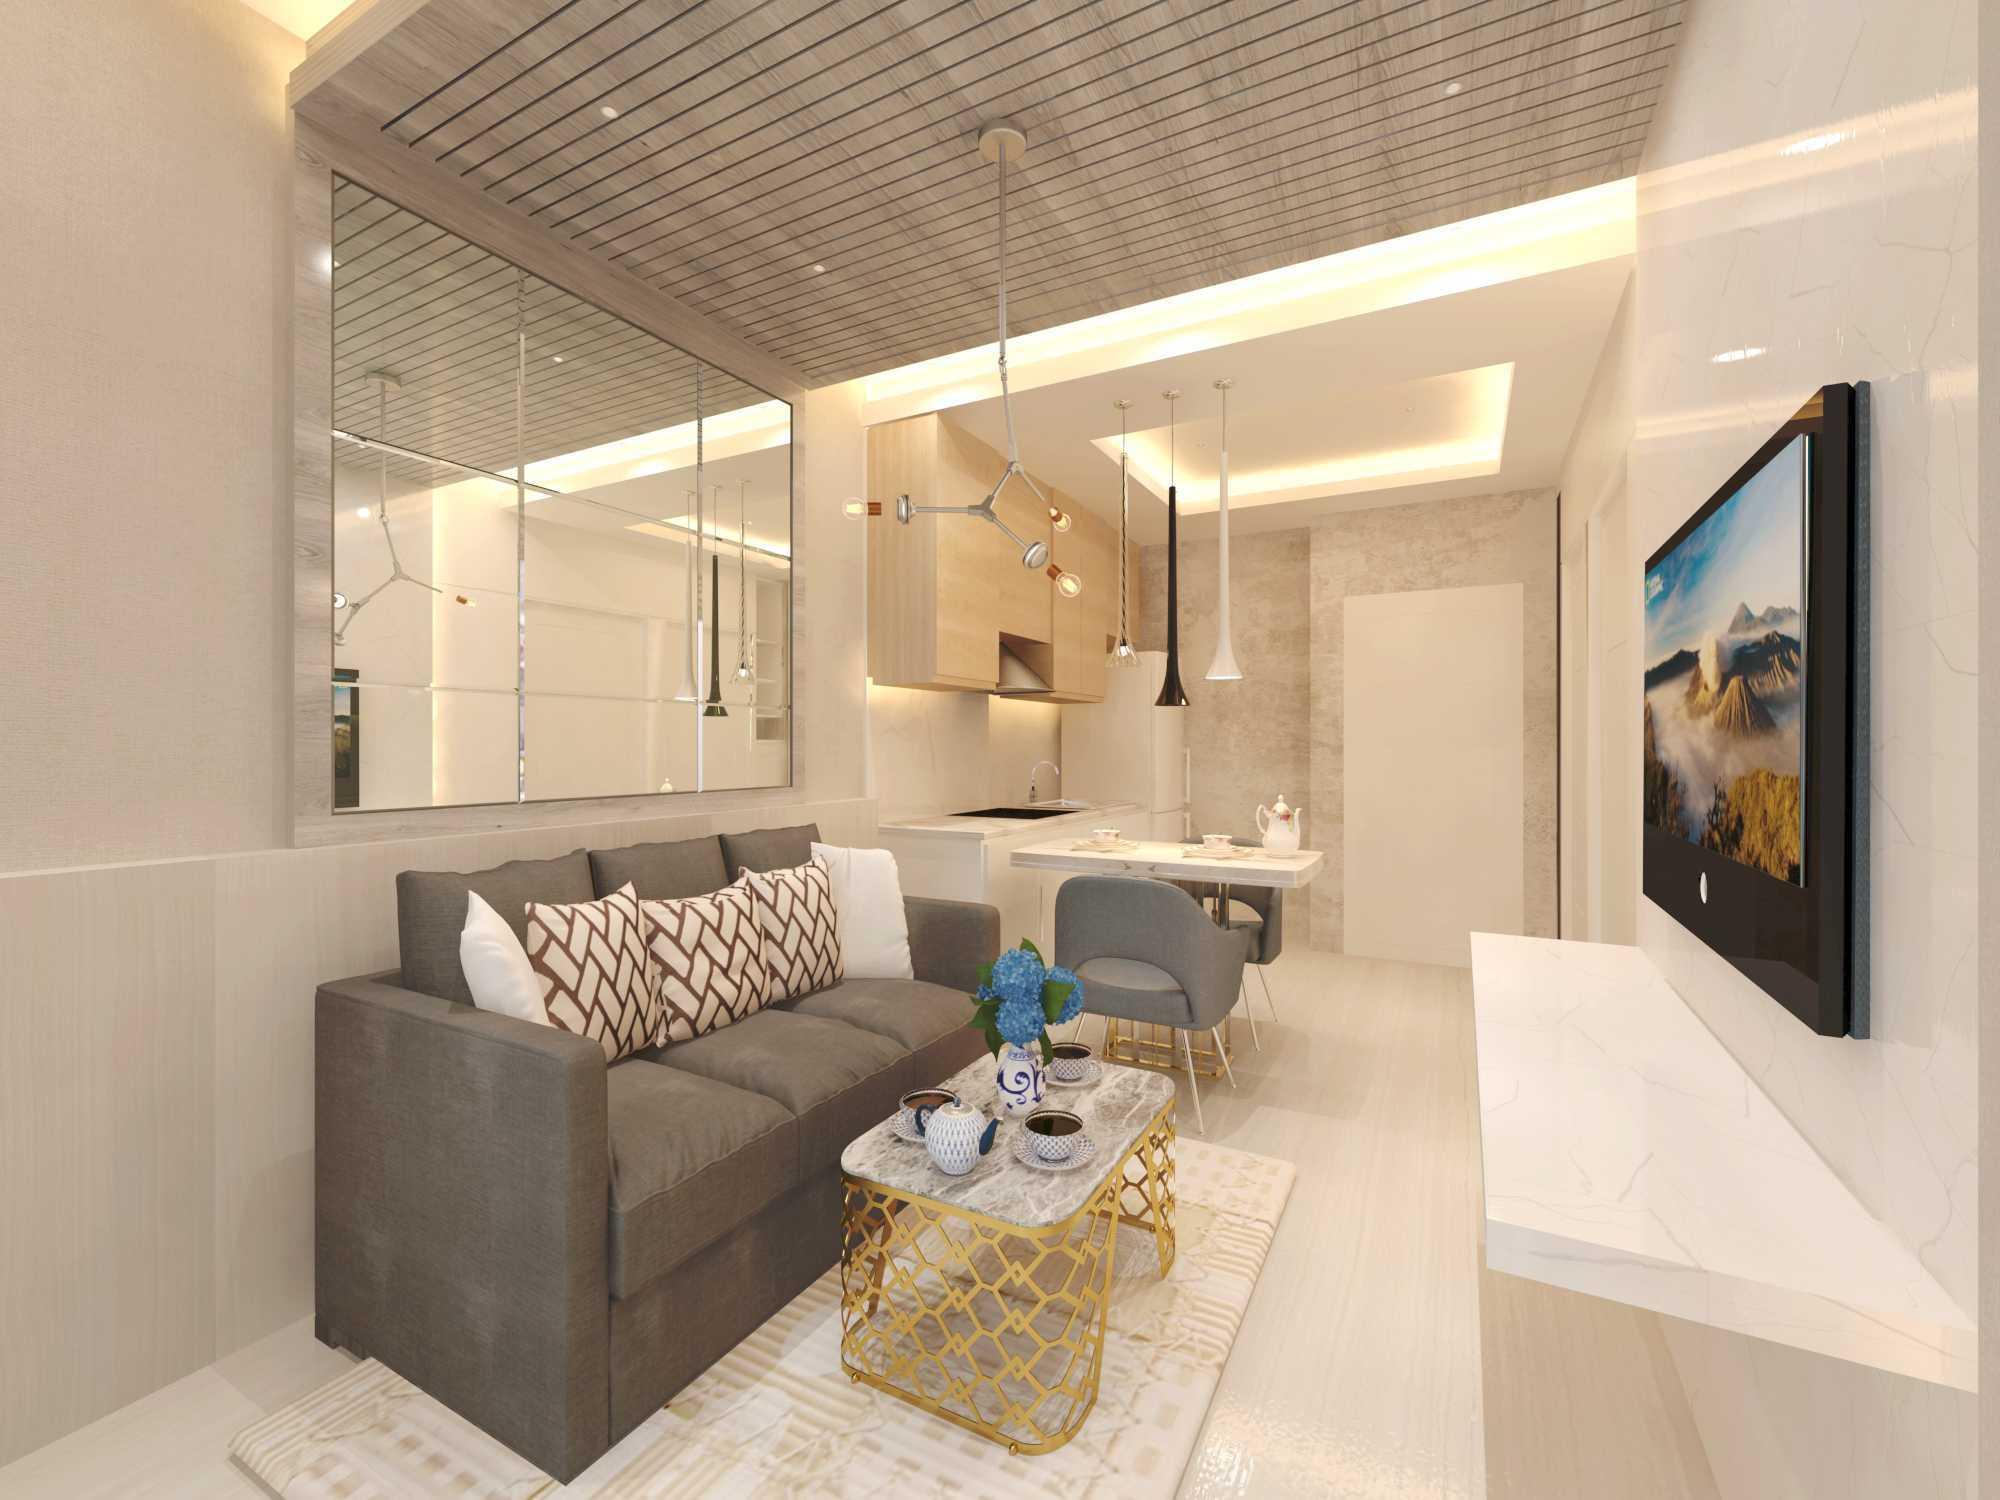 Foto inspirasi ide desain apartemen Rinto-katili-apartment-bapak-robert-tower-heliconia-mediterania-jakarta-barat oleh Rinto Katili di Arsitag